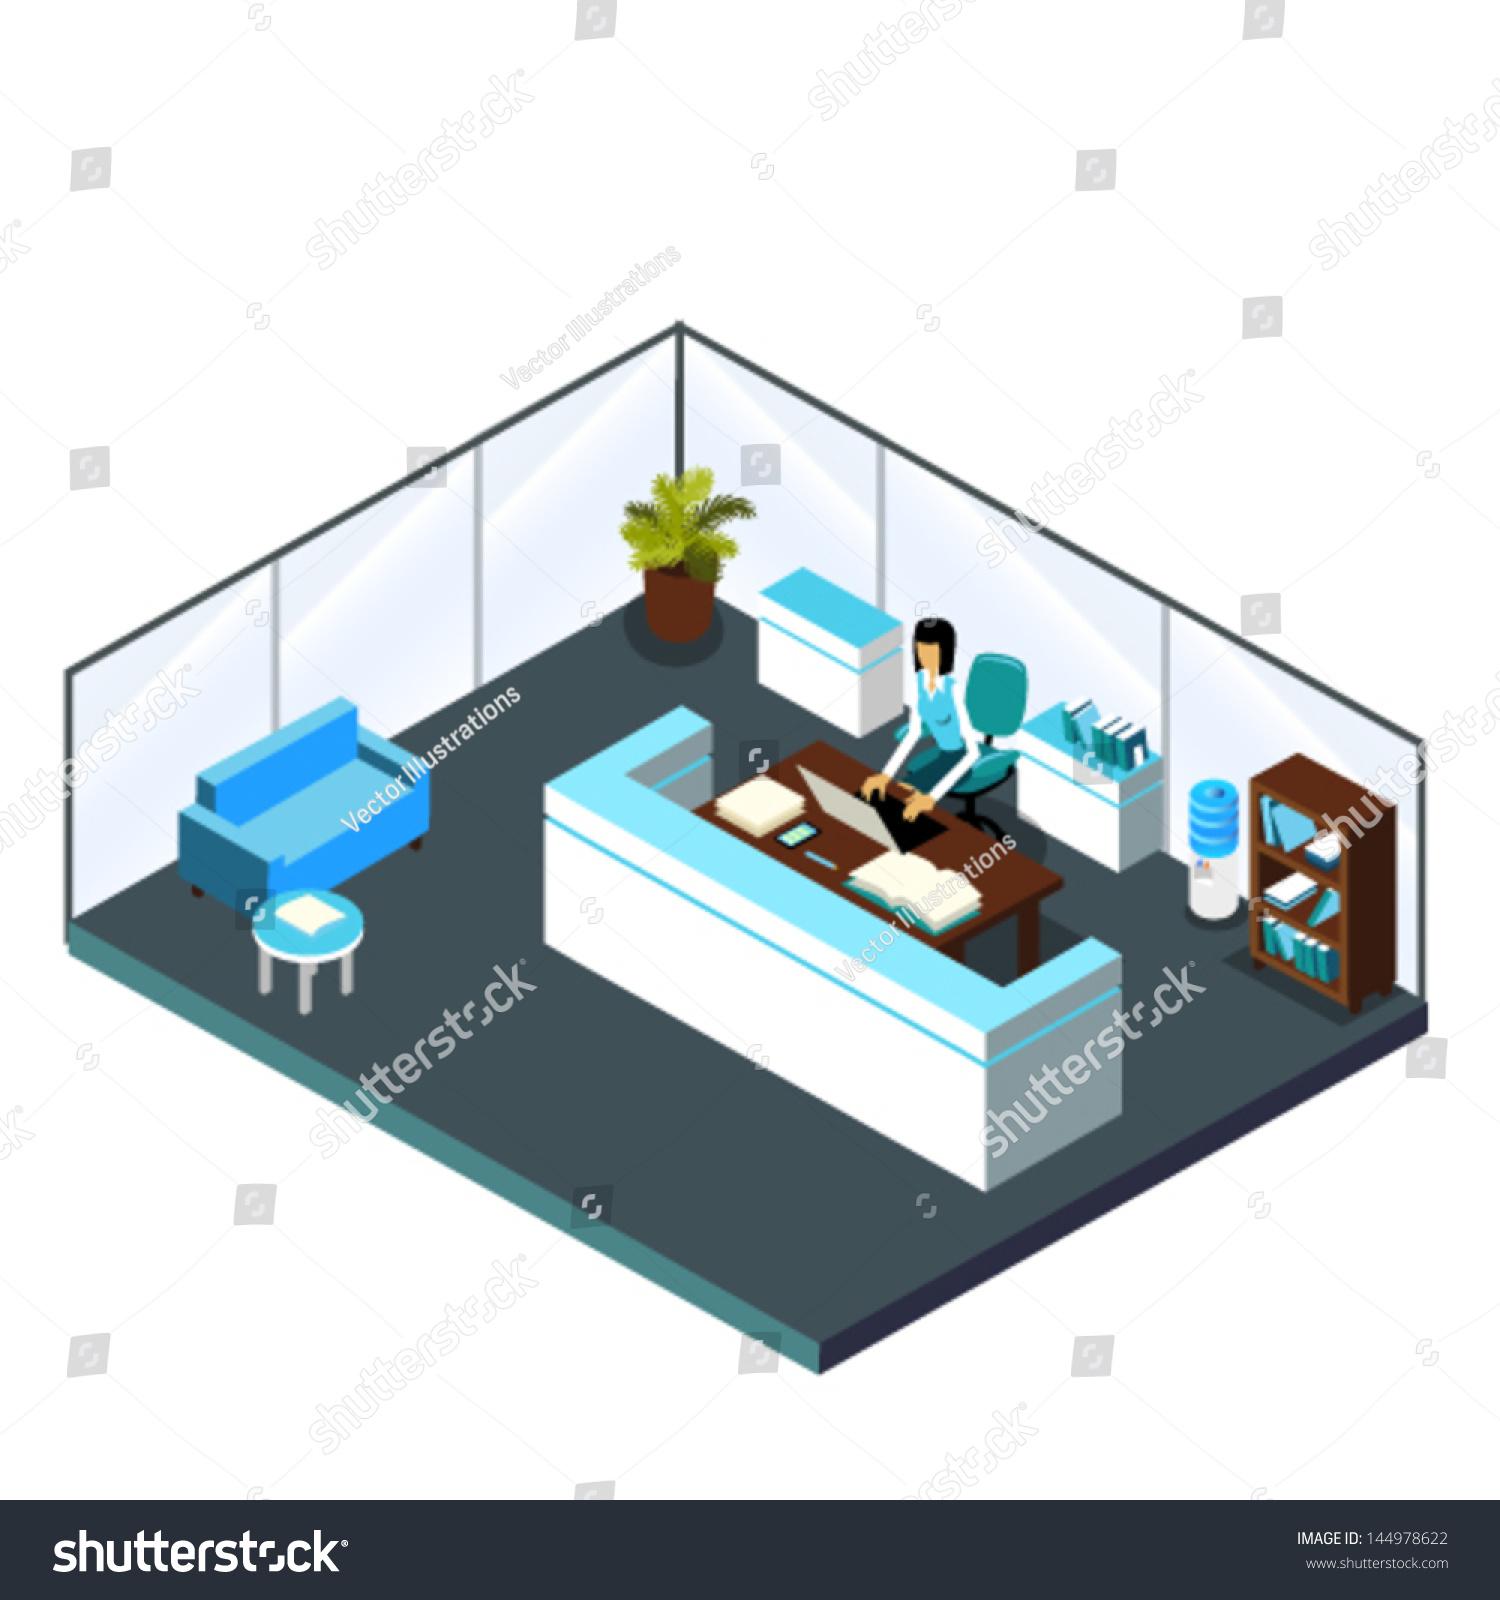 3d Floor Plan Isometric: 3d Isometric Blue White Reception Interior Stock Vector